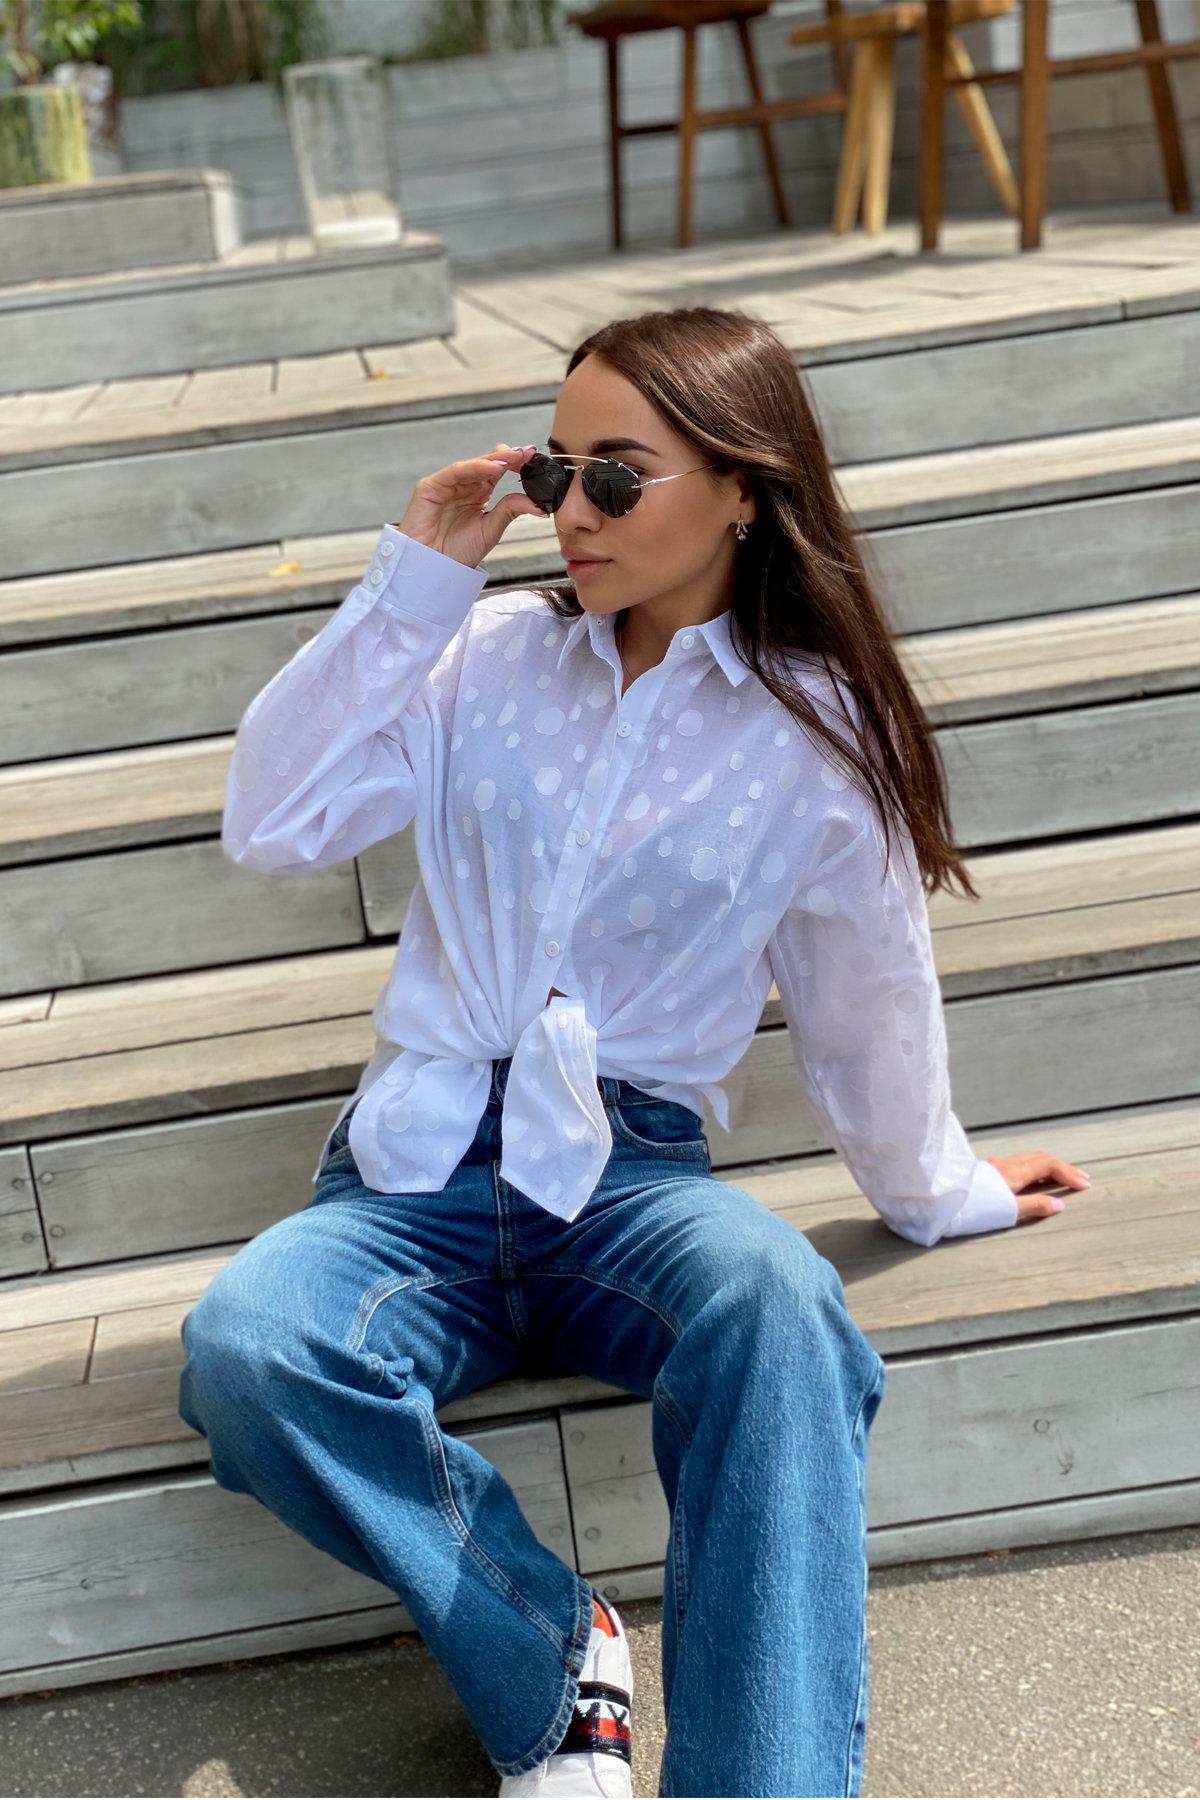 Блуза Эйплс 96242 АРТ. 45930 Цвет: Белый - фото 9, интернет магазин tm-modus.ru